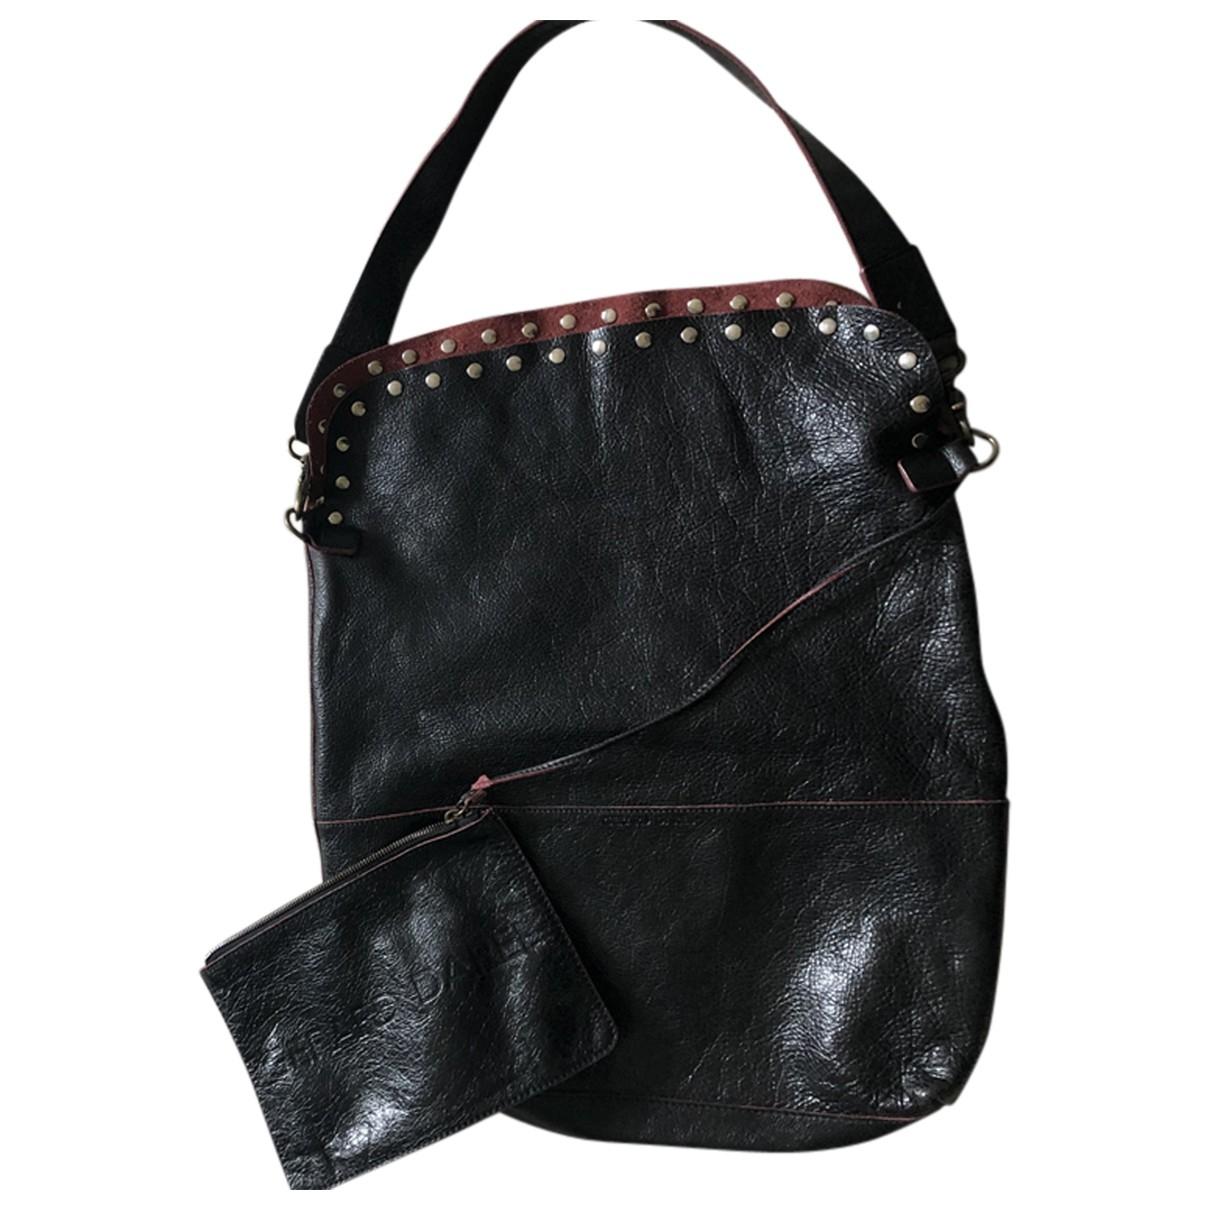 Gerard Darel \N Black Leather handbag for Women \N